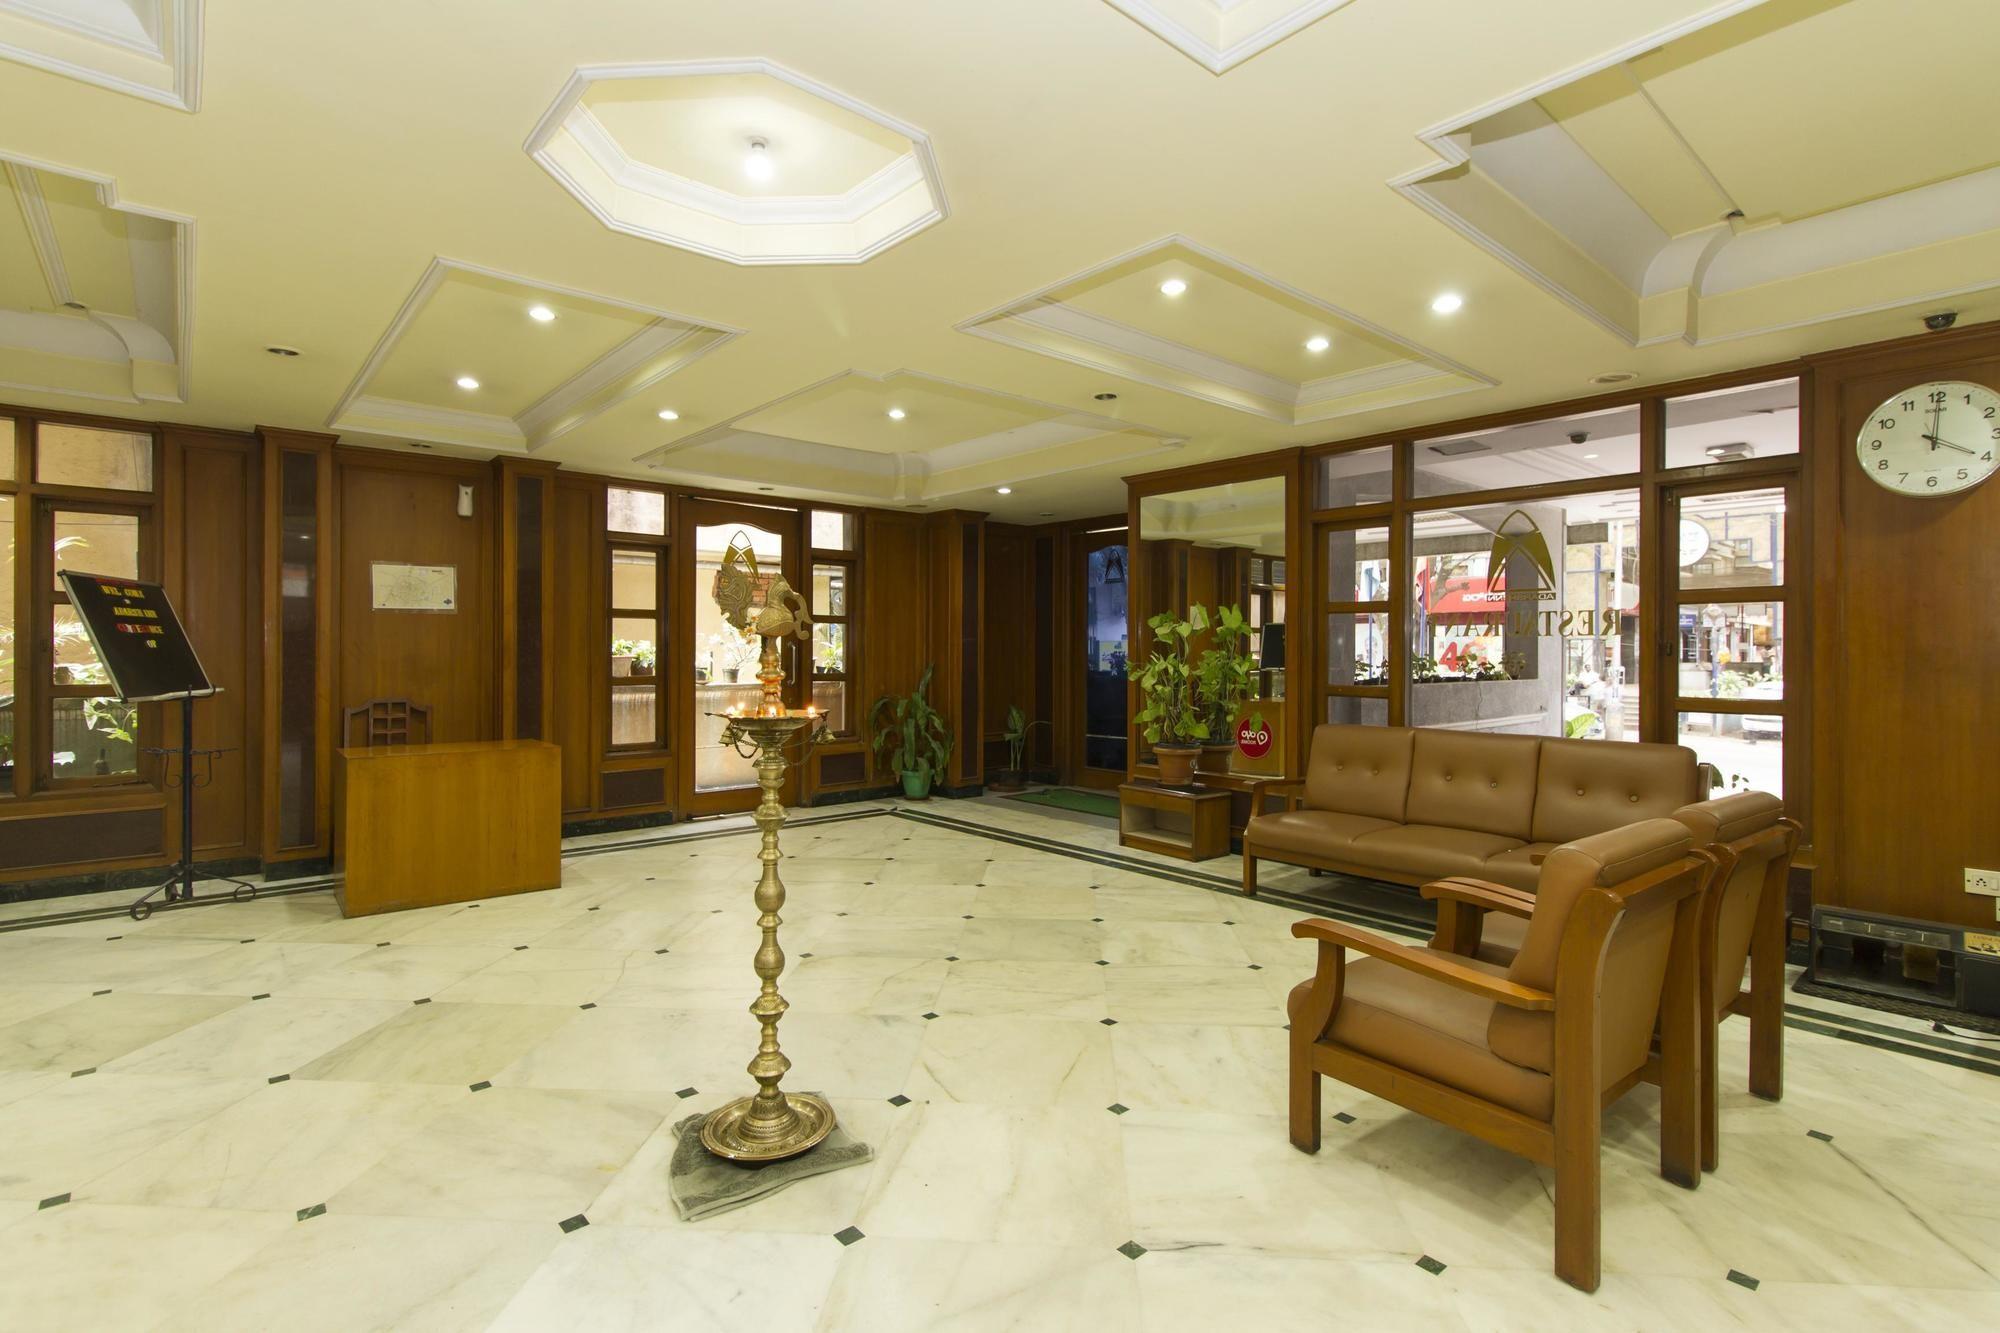 Oyo Rooms Majestic 2